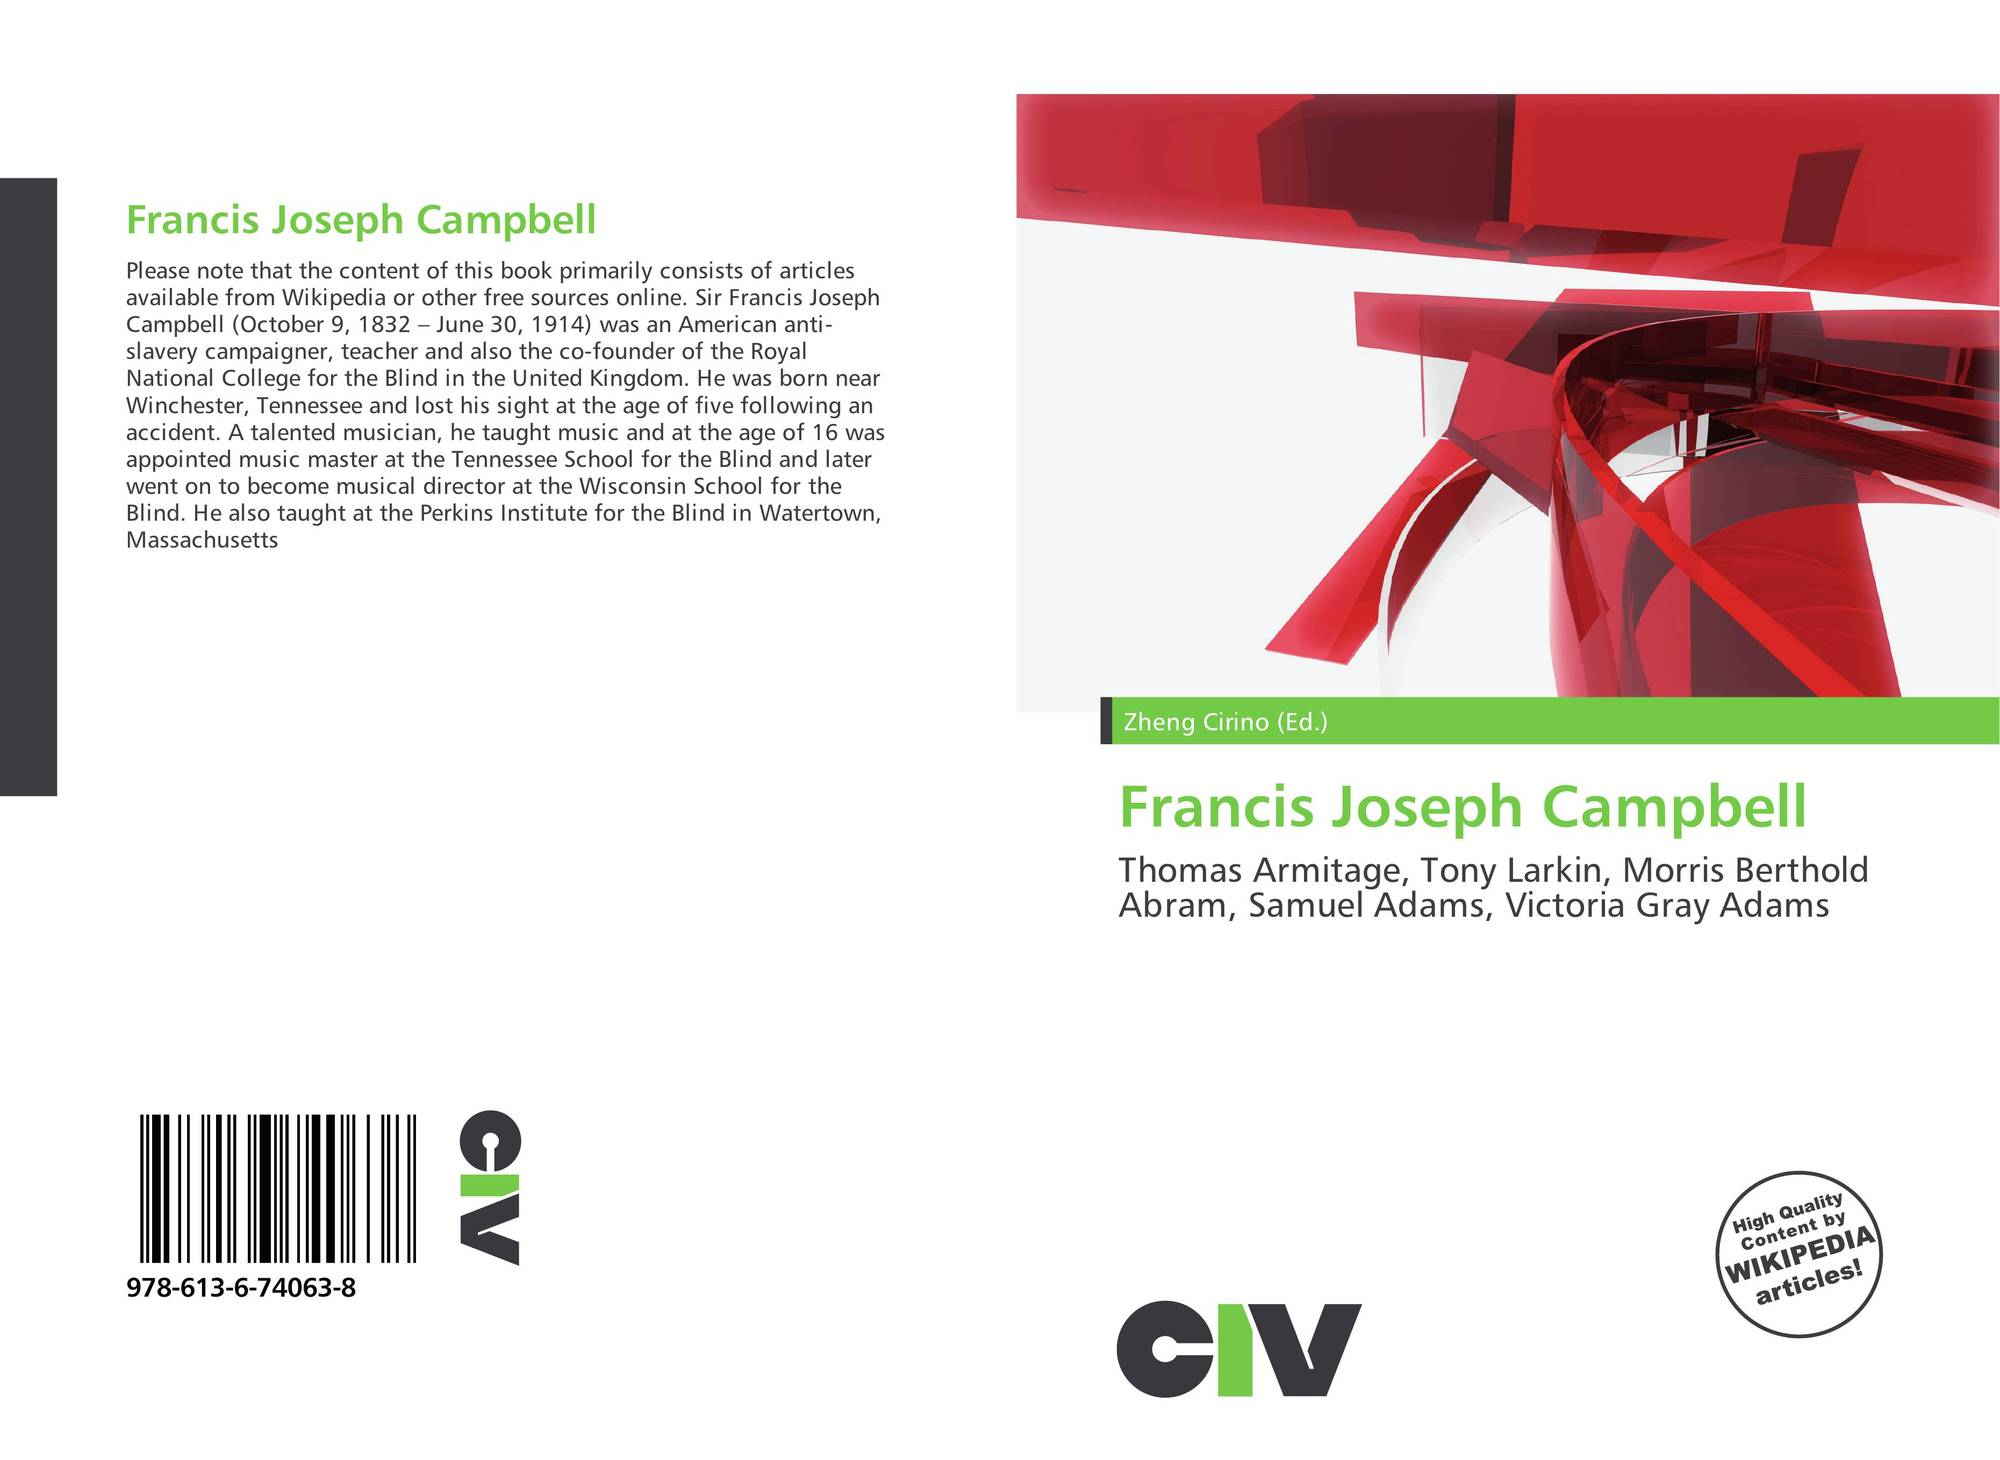 Francis Joseph Campbell